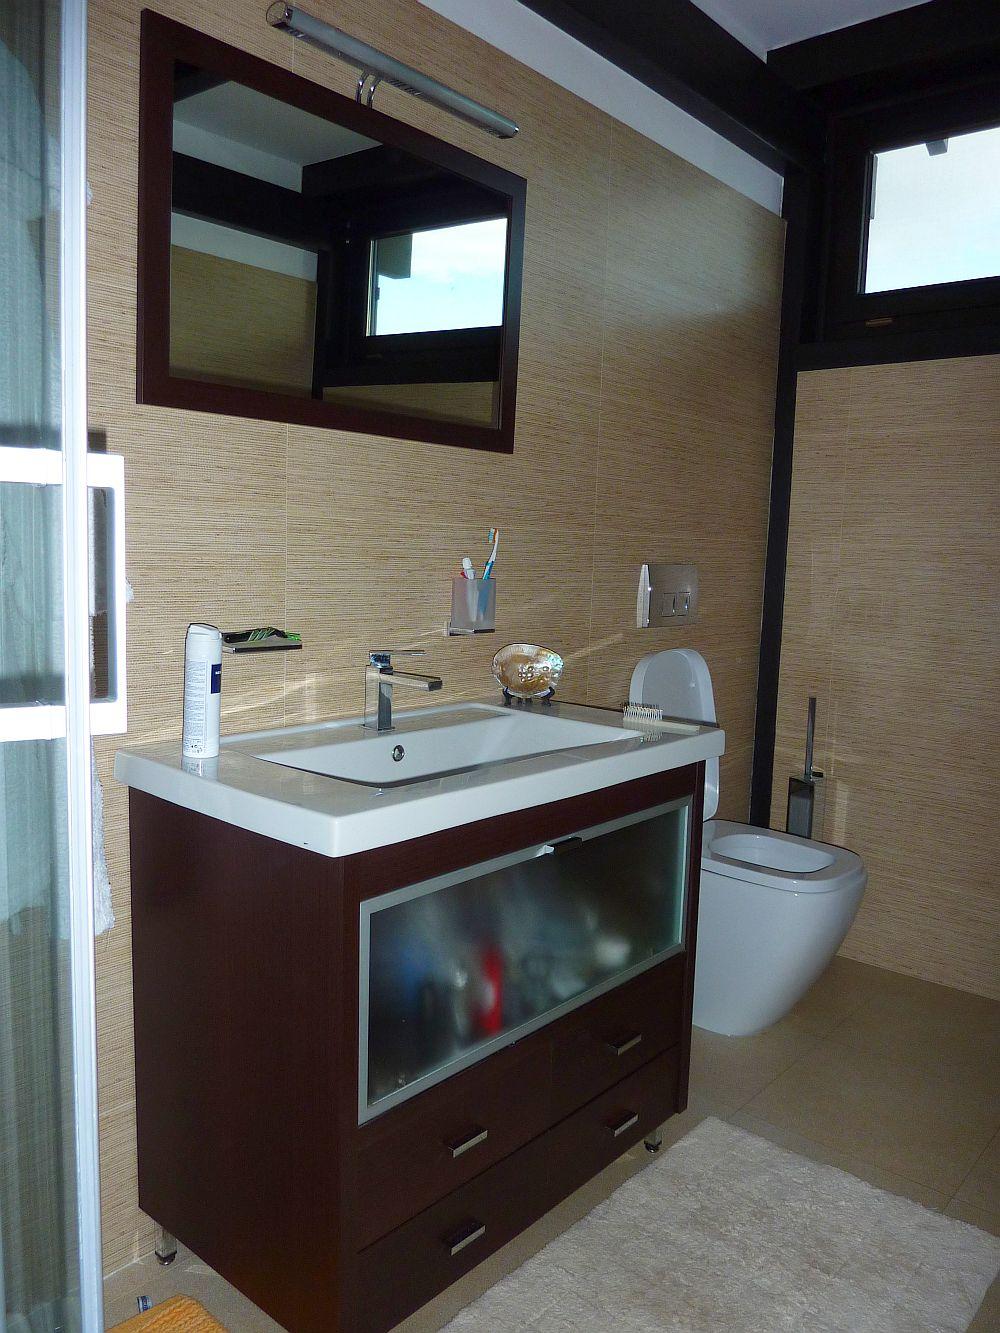 adelaparvu.com despre casa modulara pe sistem de barne, arhitectura Soleta (23)